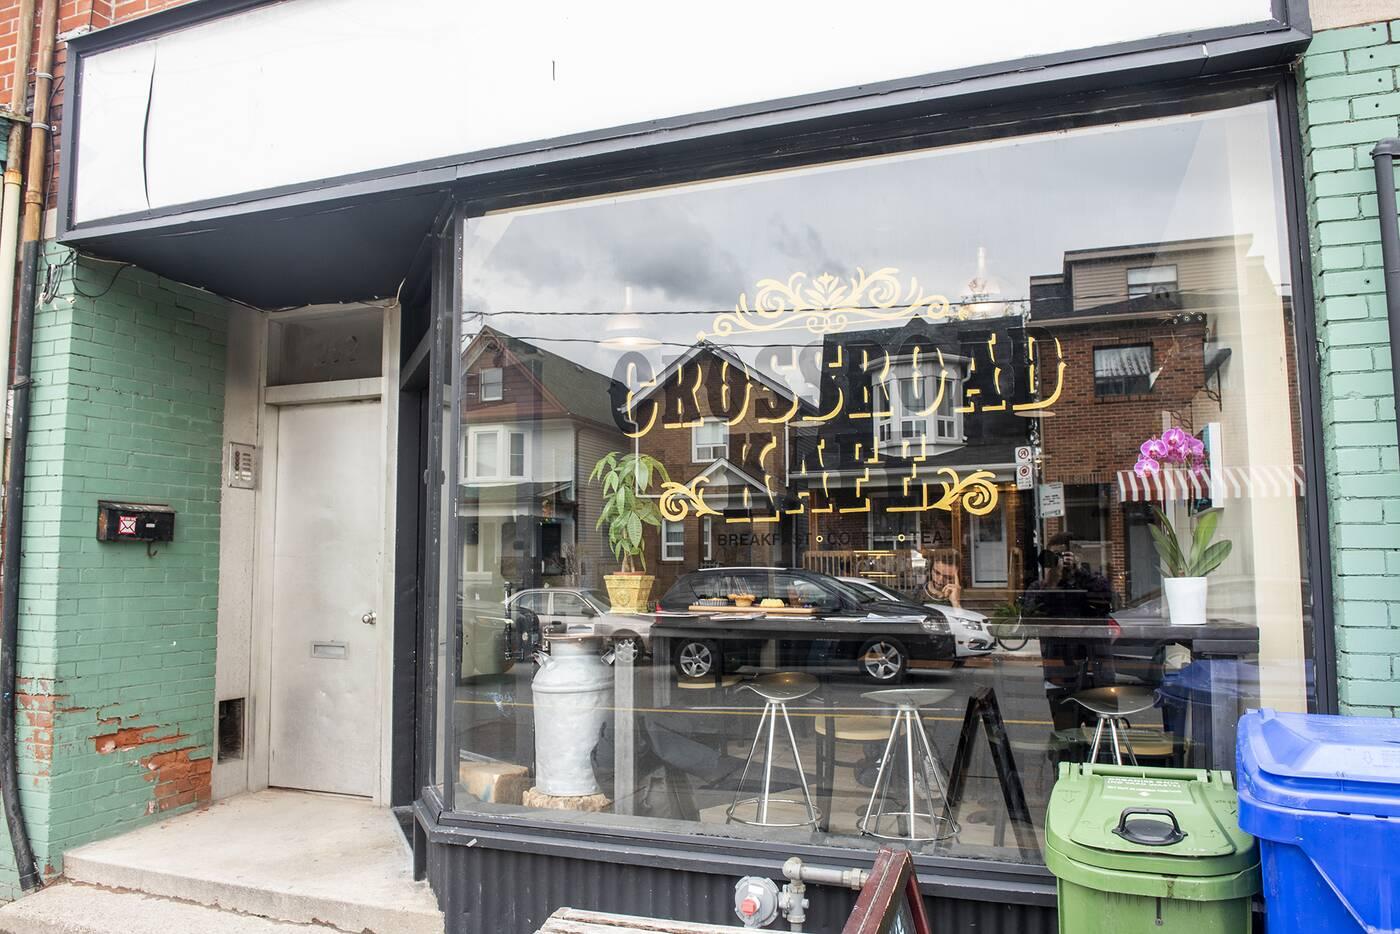 Crossroad Kafe Toronto